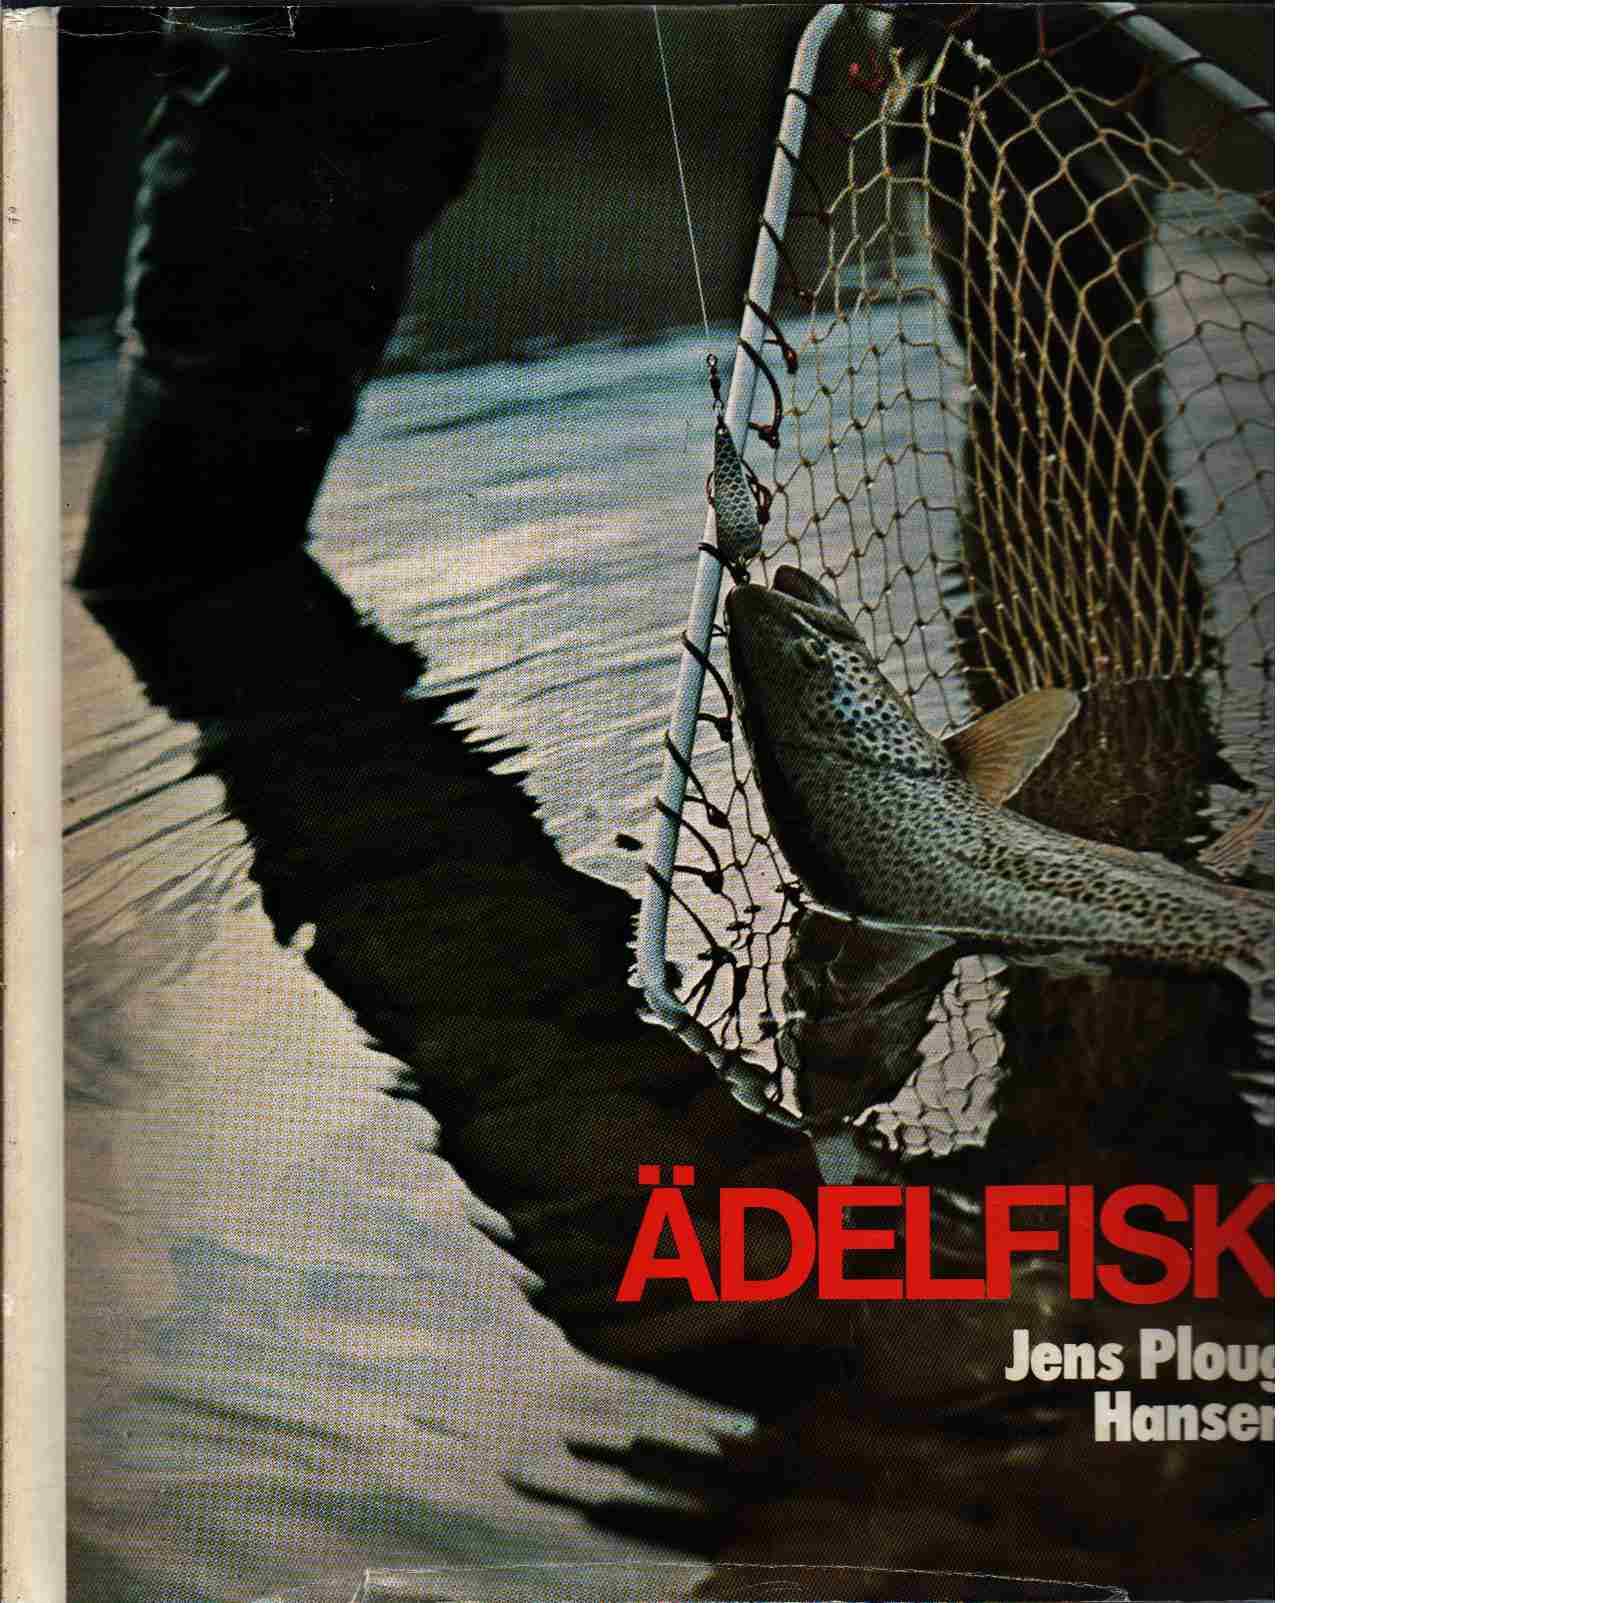 Ädelfisk - Ploug Hansen, Jens